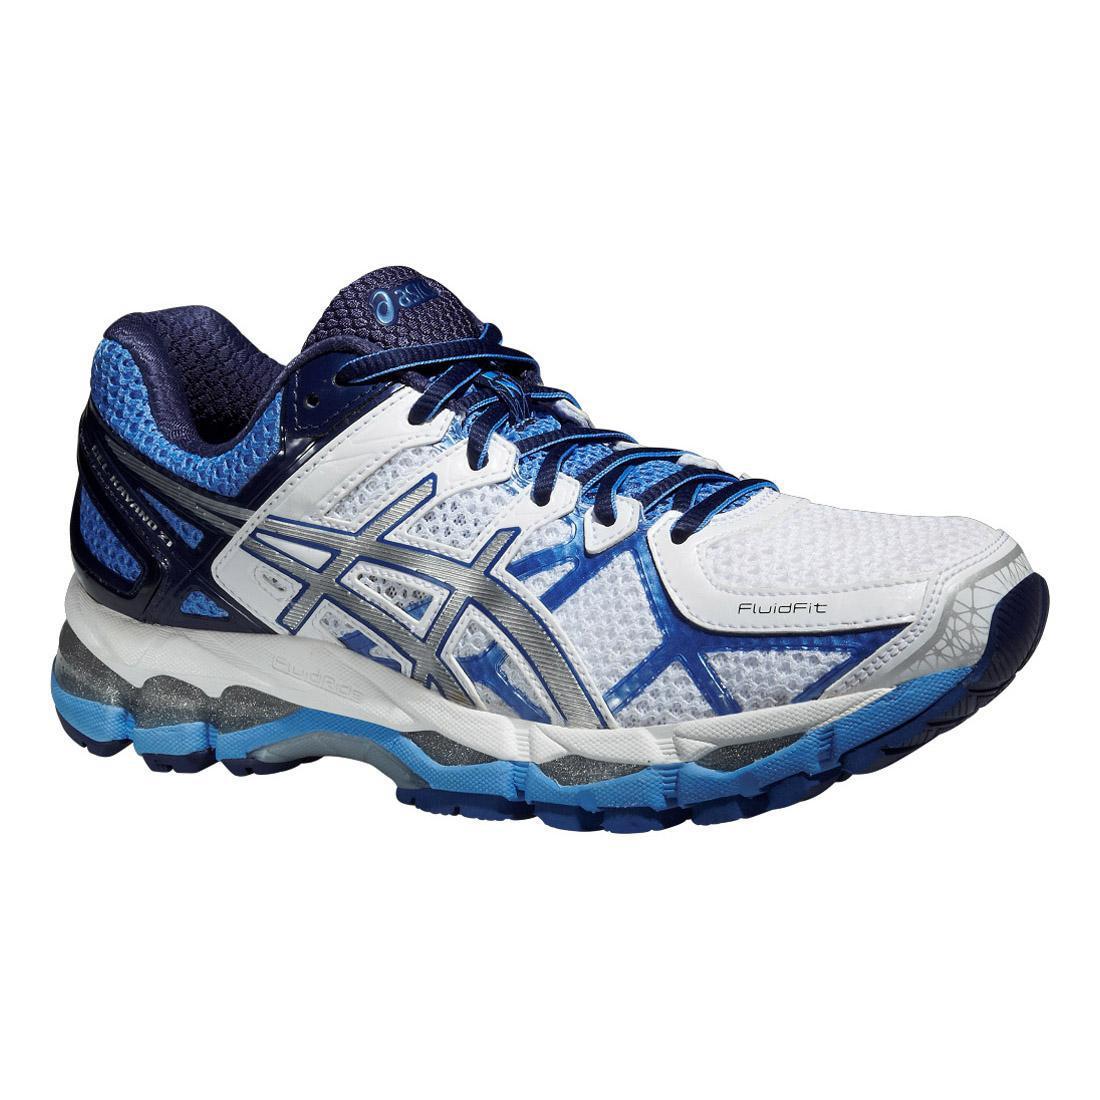 promo code 05551 1dc37 Asics Womens GEL-Kayano 21 Running Shoes - White Blue - Tennisnuts.com